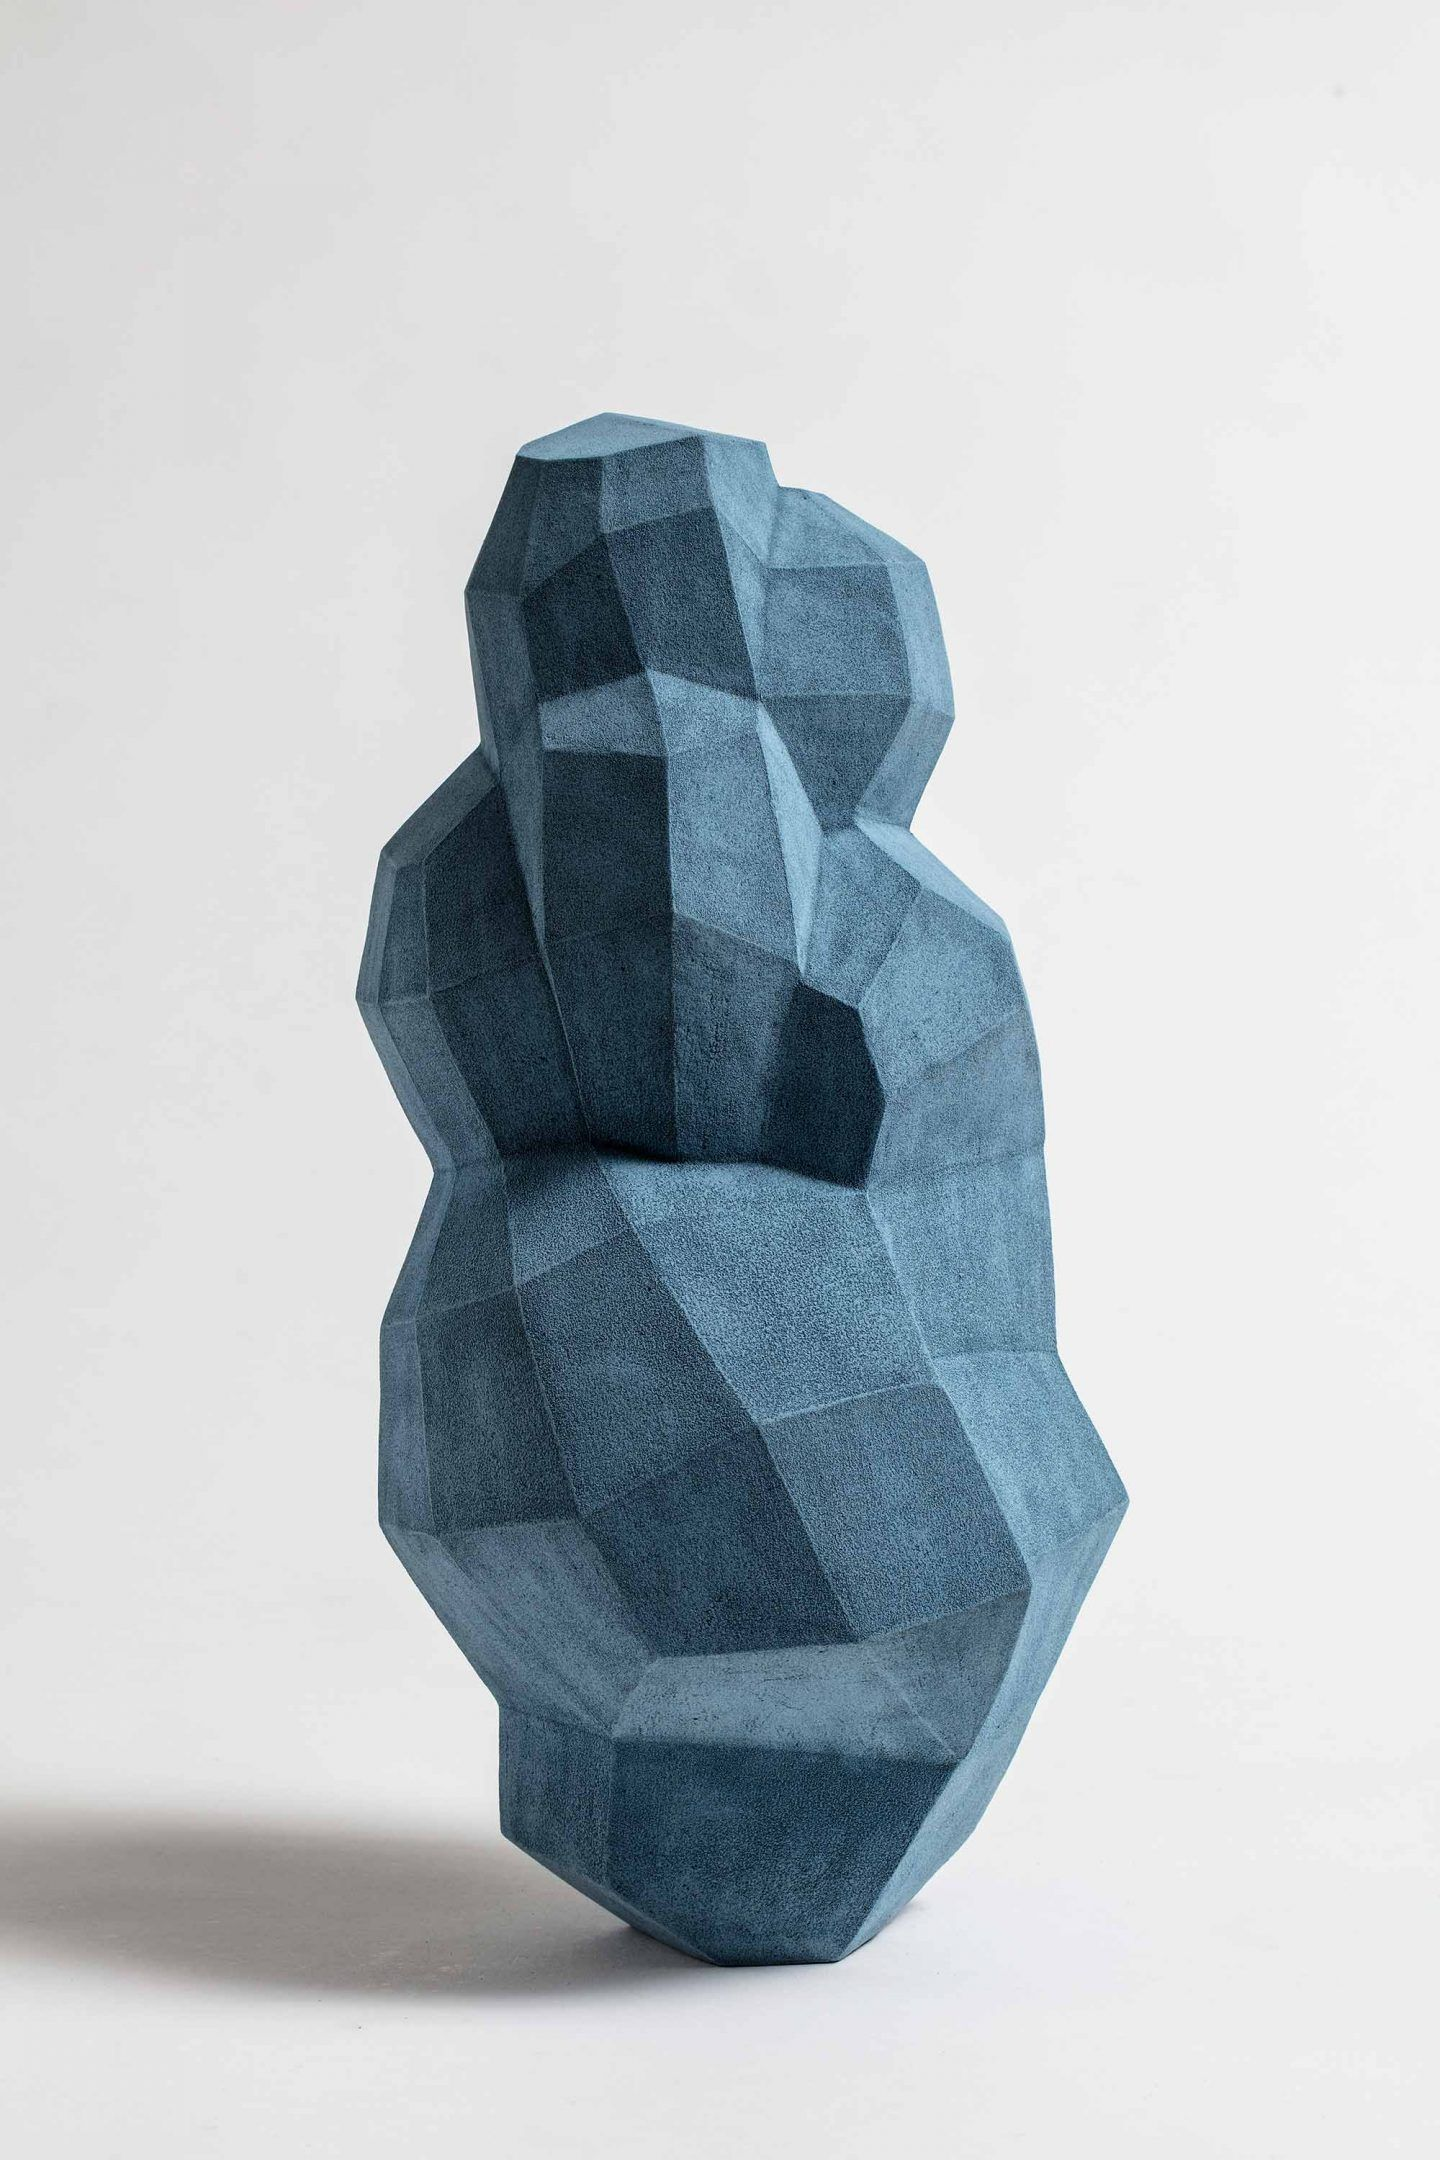 IGNANT-Design-Turi-Heisselberg-New-09